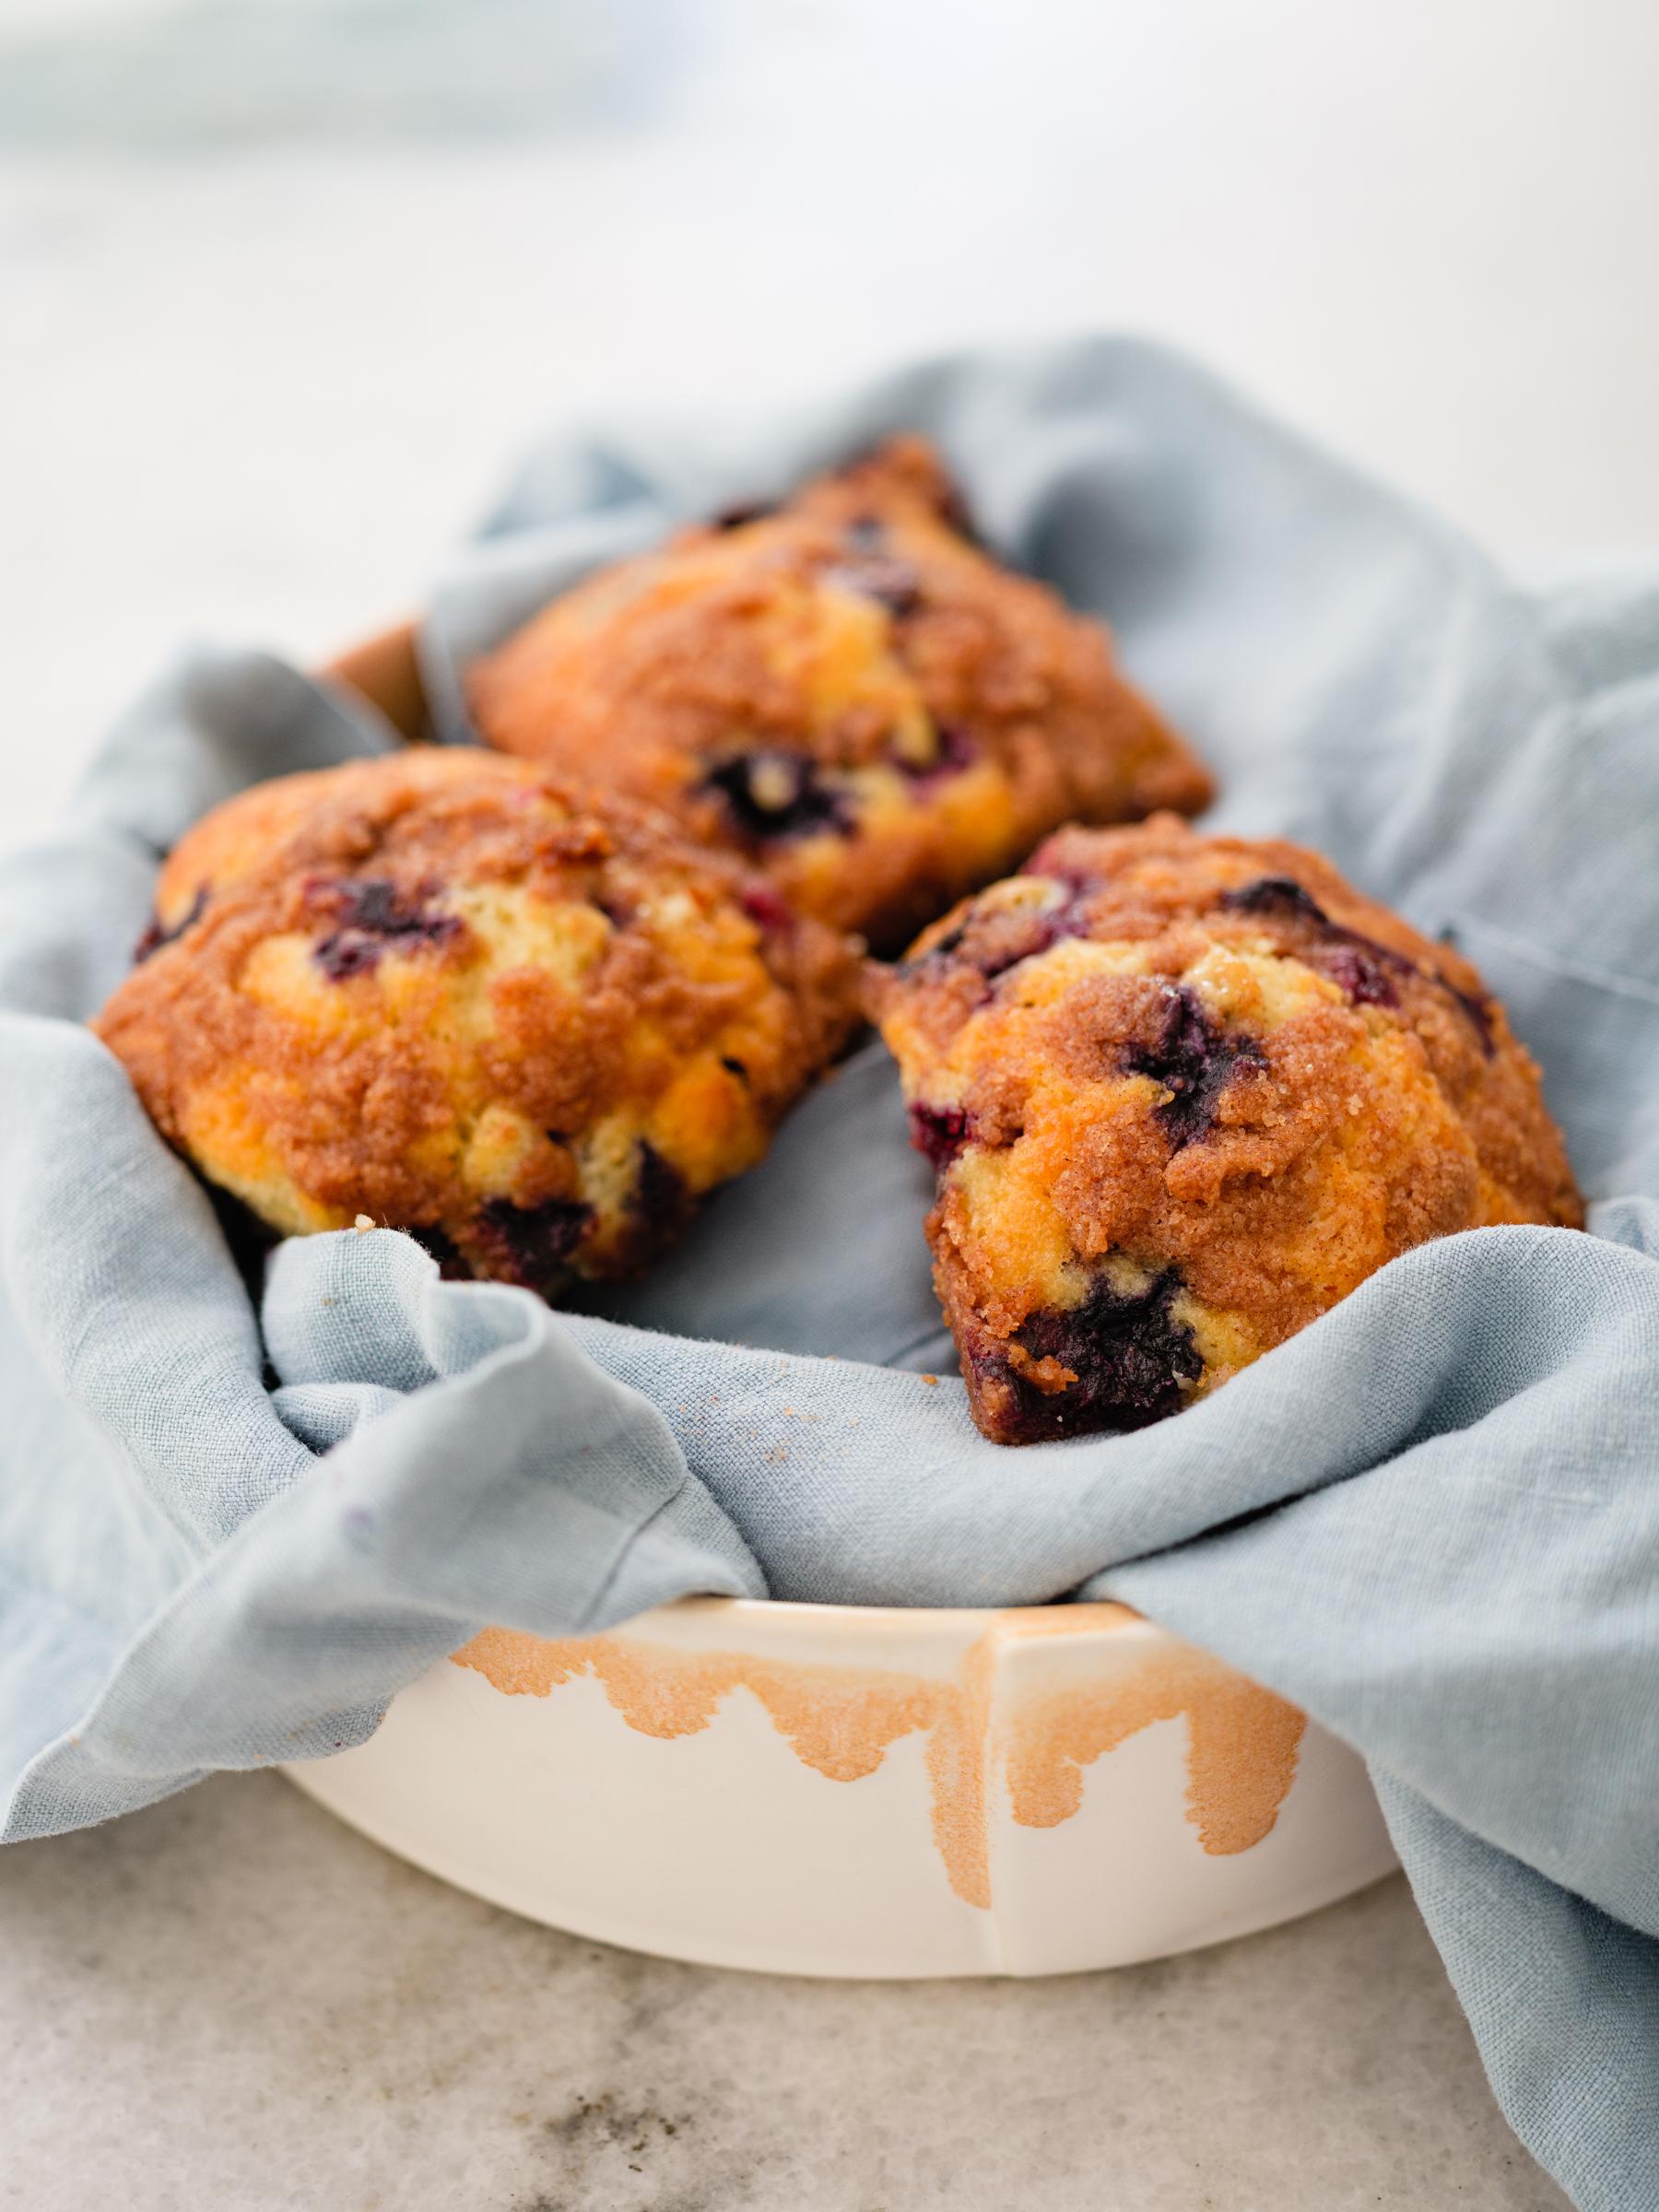 Eva Amurri shares her recipe for Blueberry Crumble Muffins